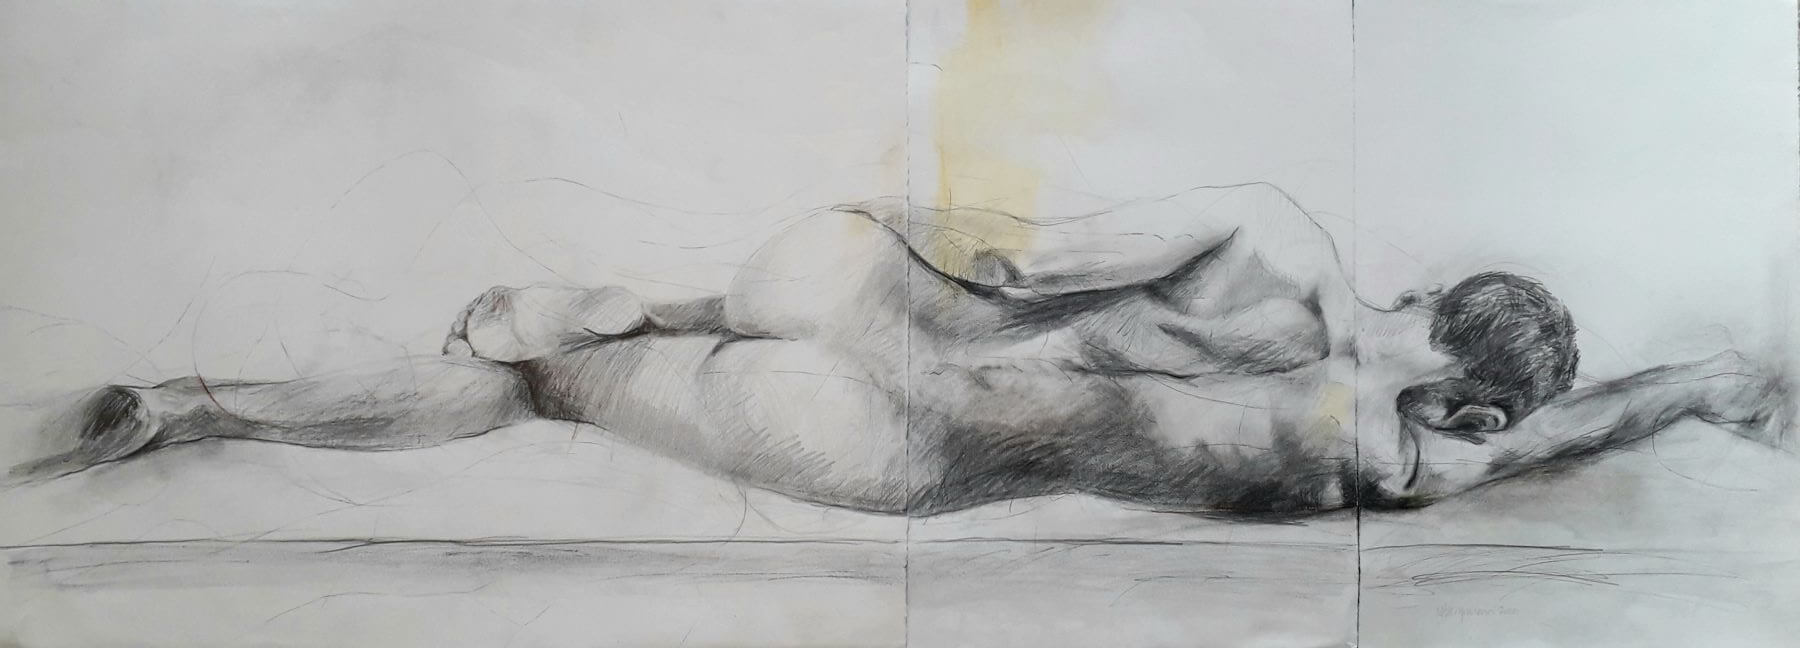 Boy - drawing, graphite on paper by artist Neva Bergemann